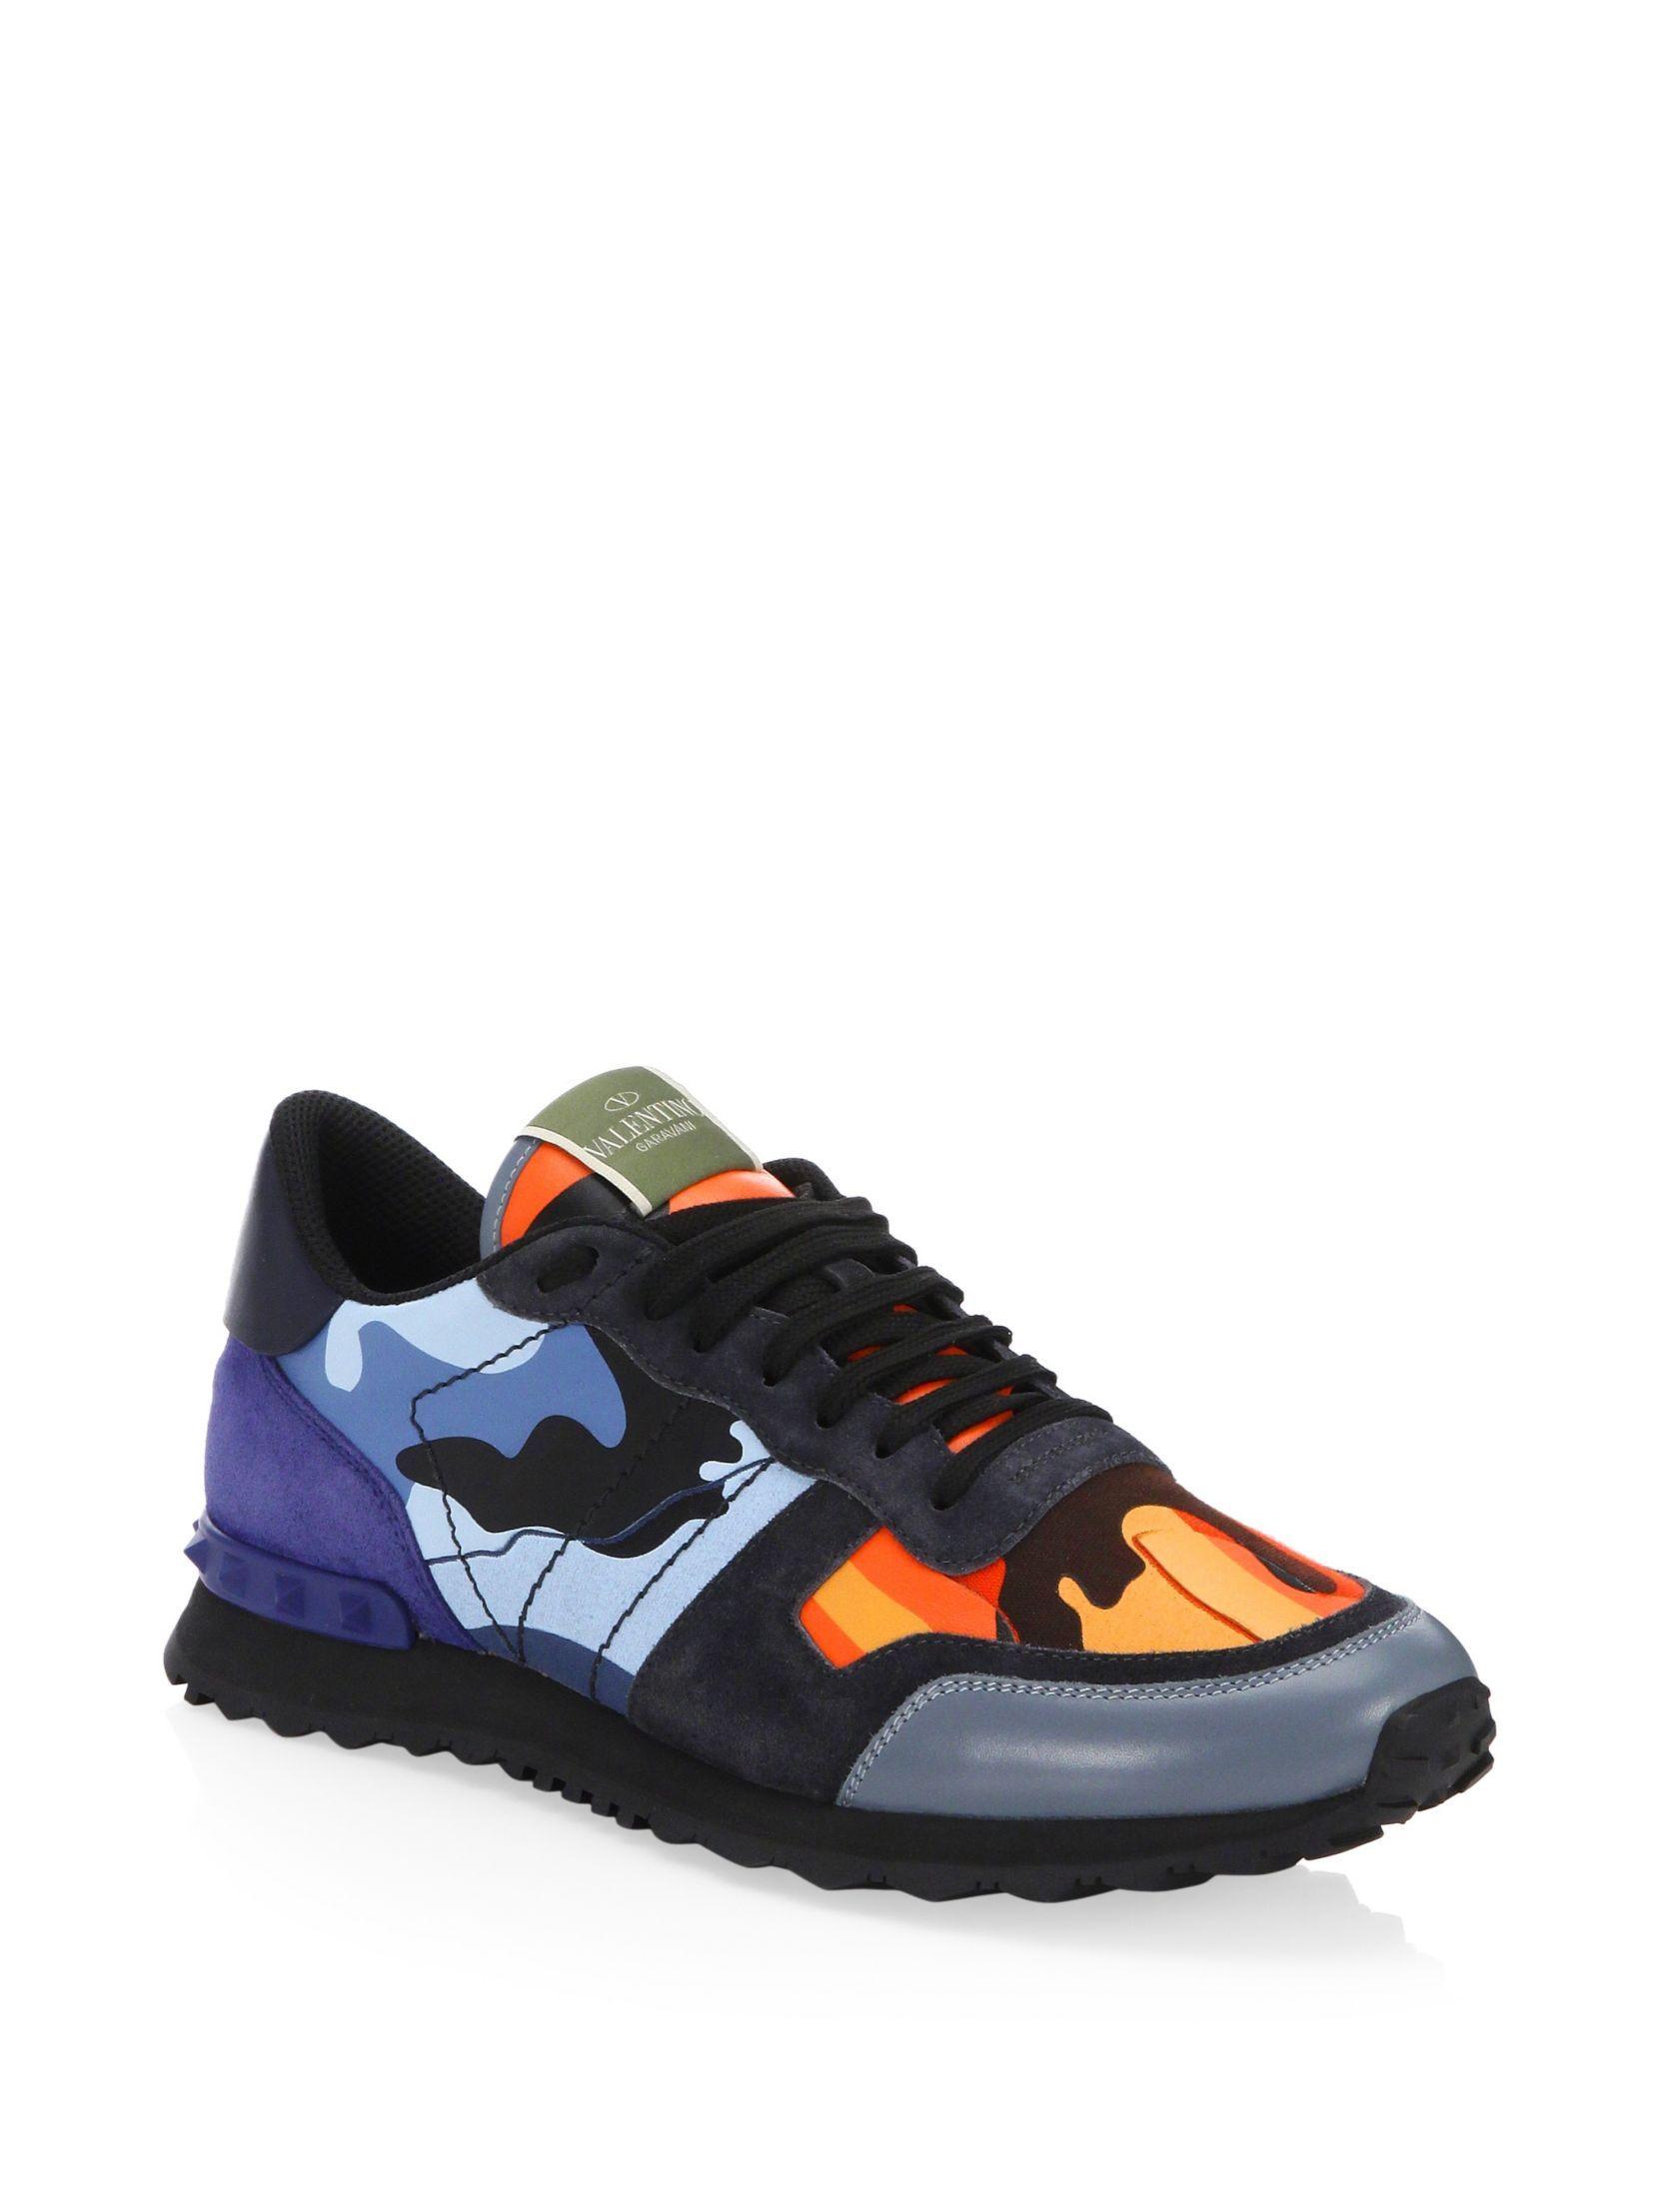 b95ced206c12 Valentino Garavani Rockrunner Multicolor Camouflage Sneakers   Shoes ...